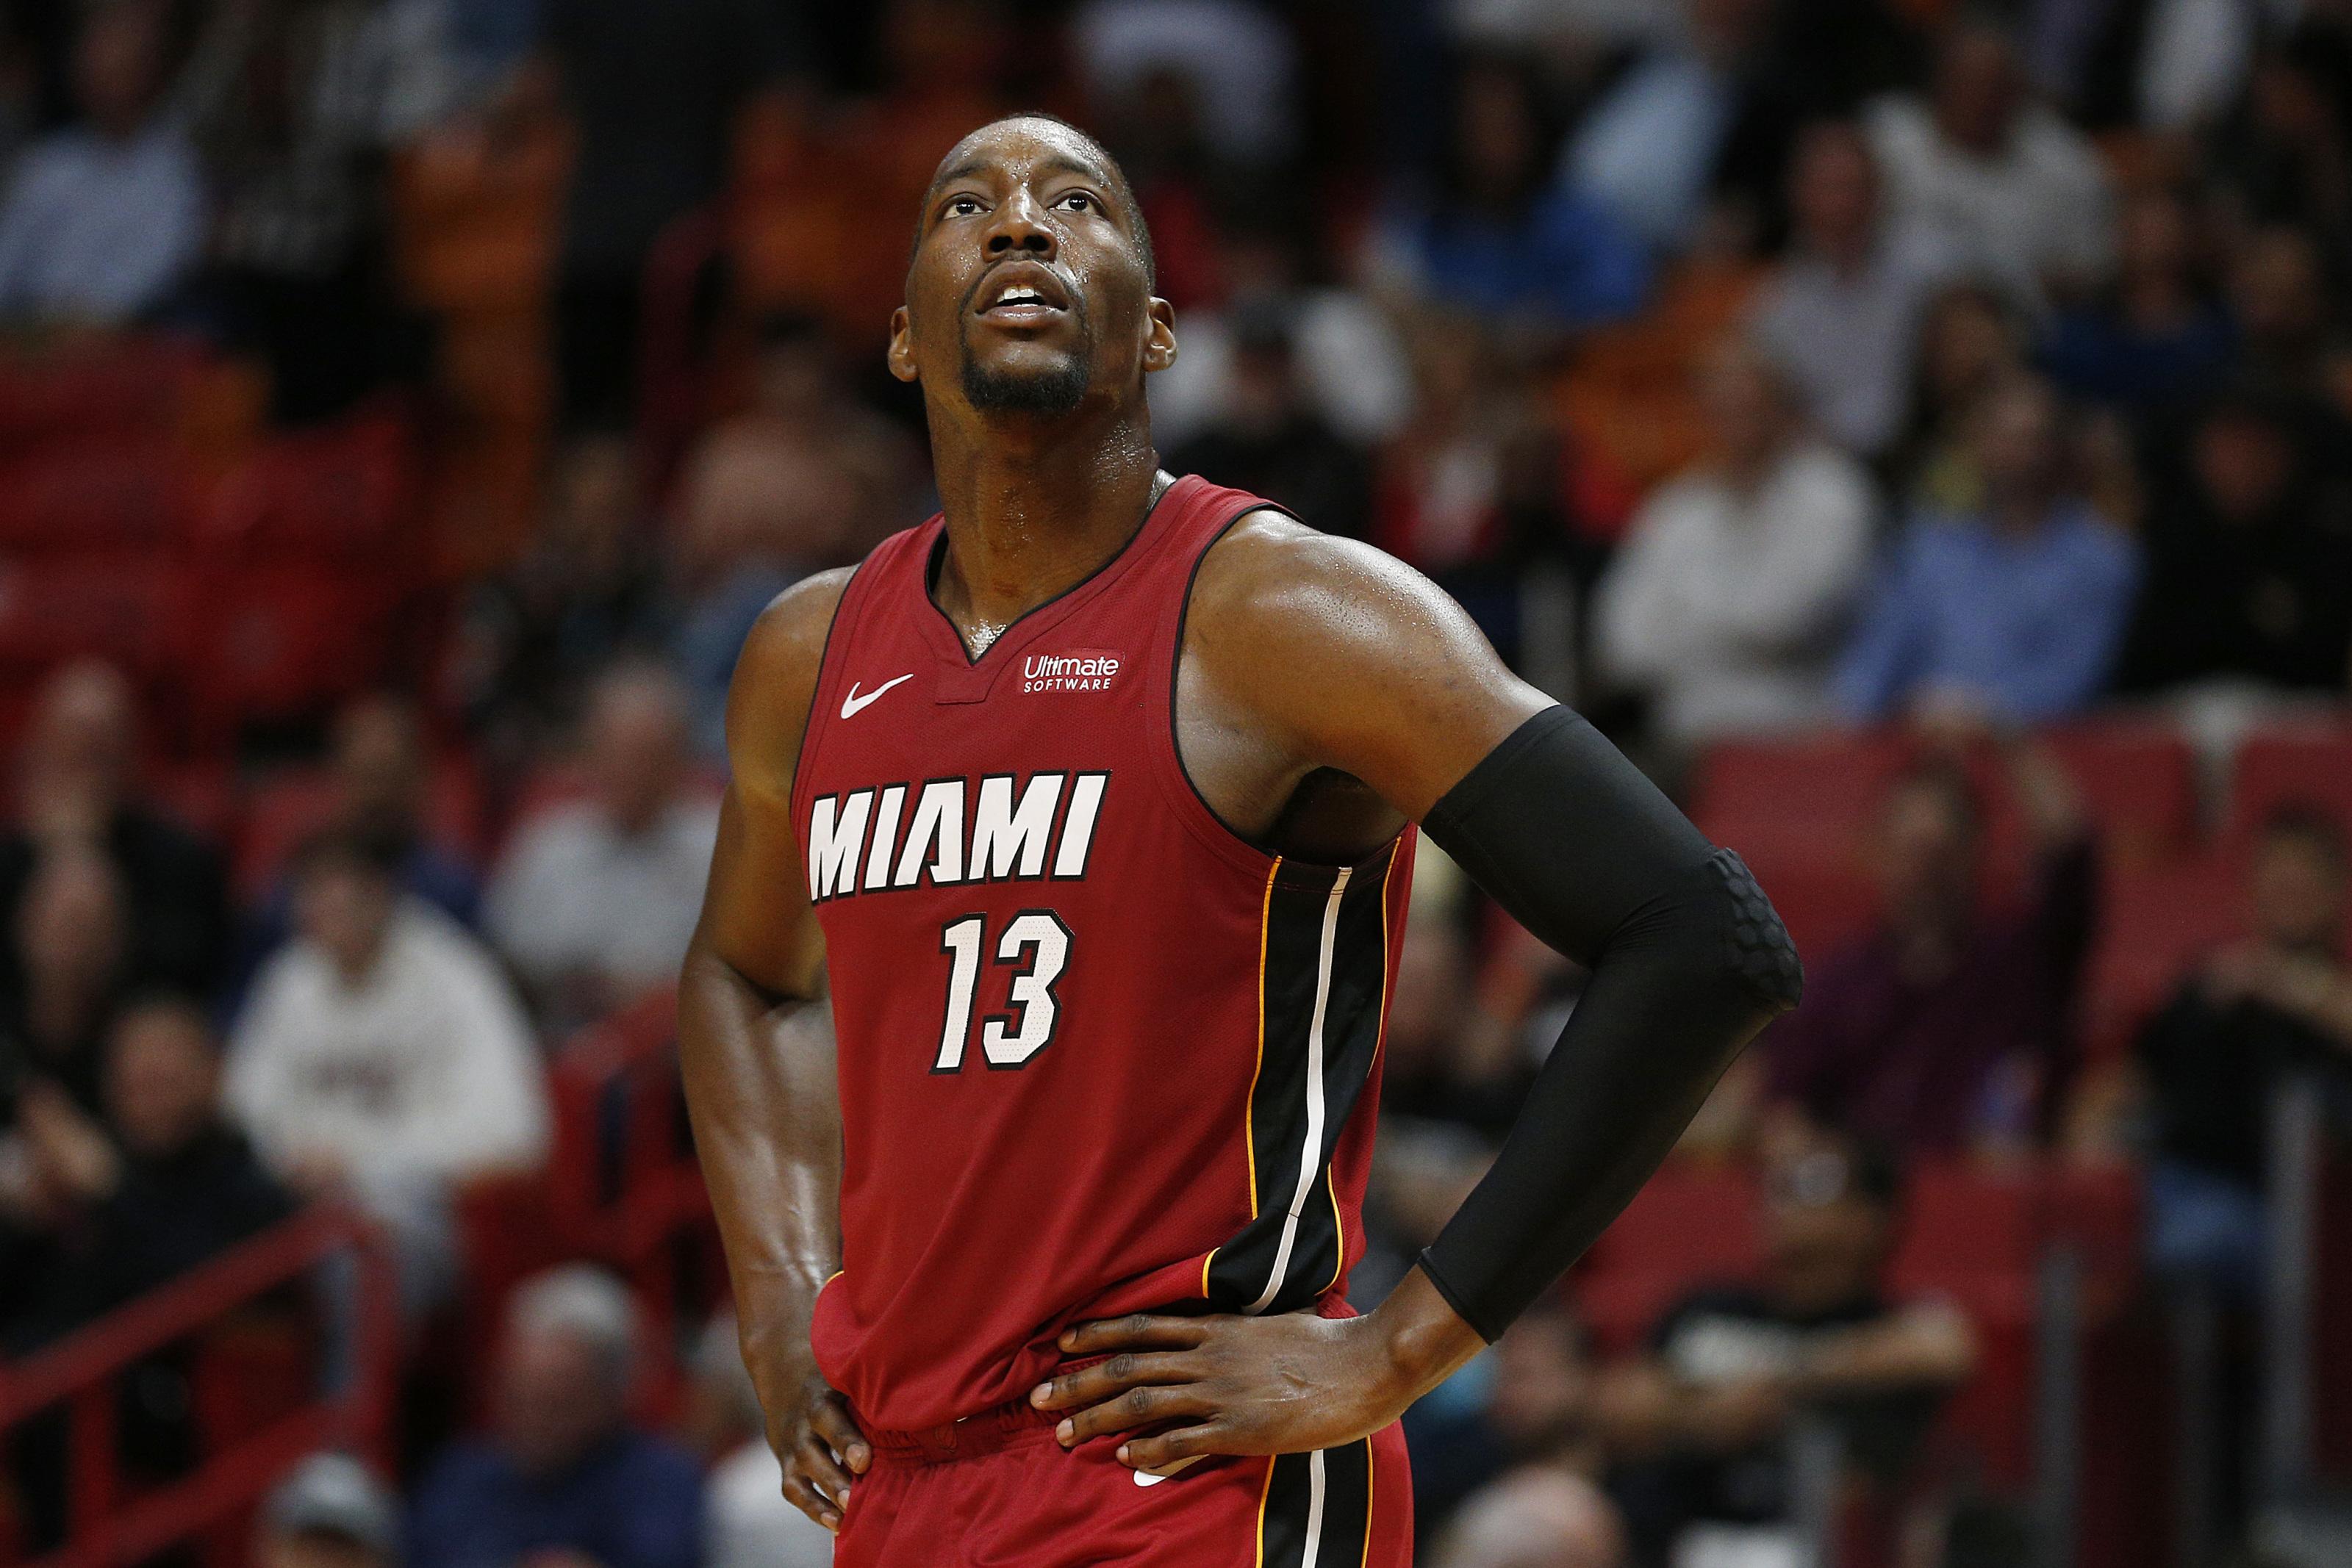 Miami Heat Versatility Can Propel Heat Past The Bucks In The Nba Playoffs